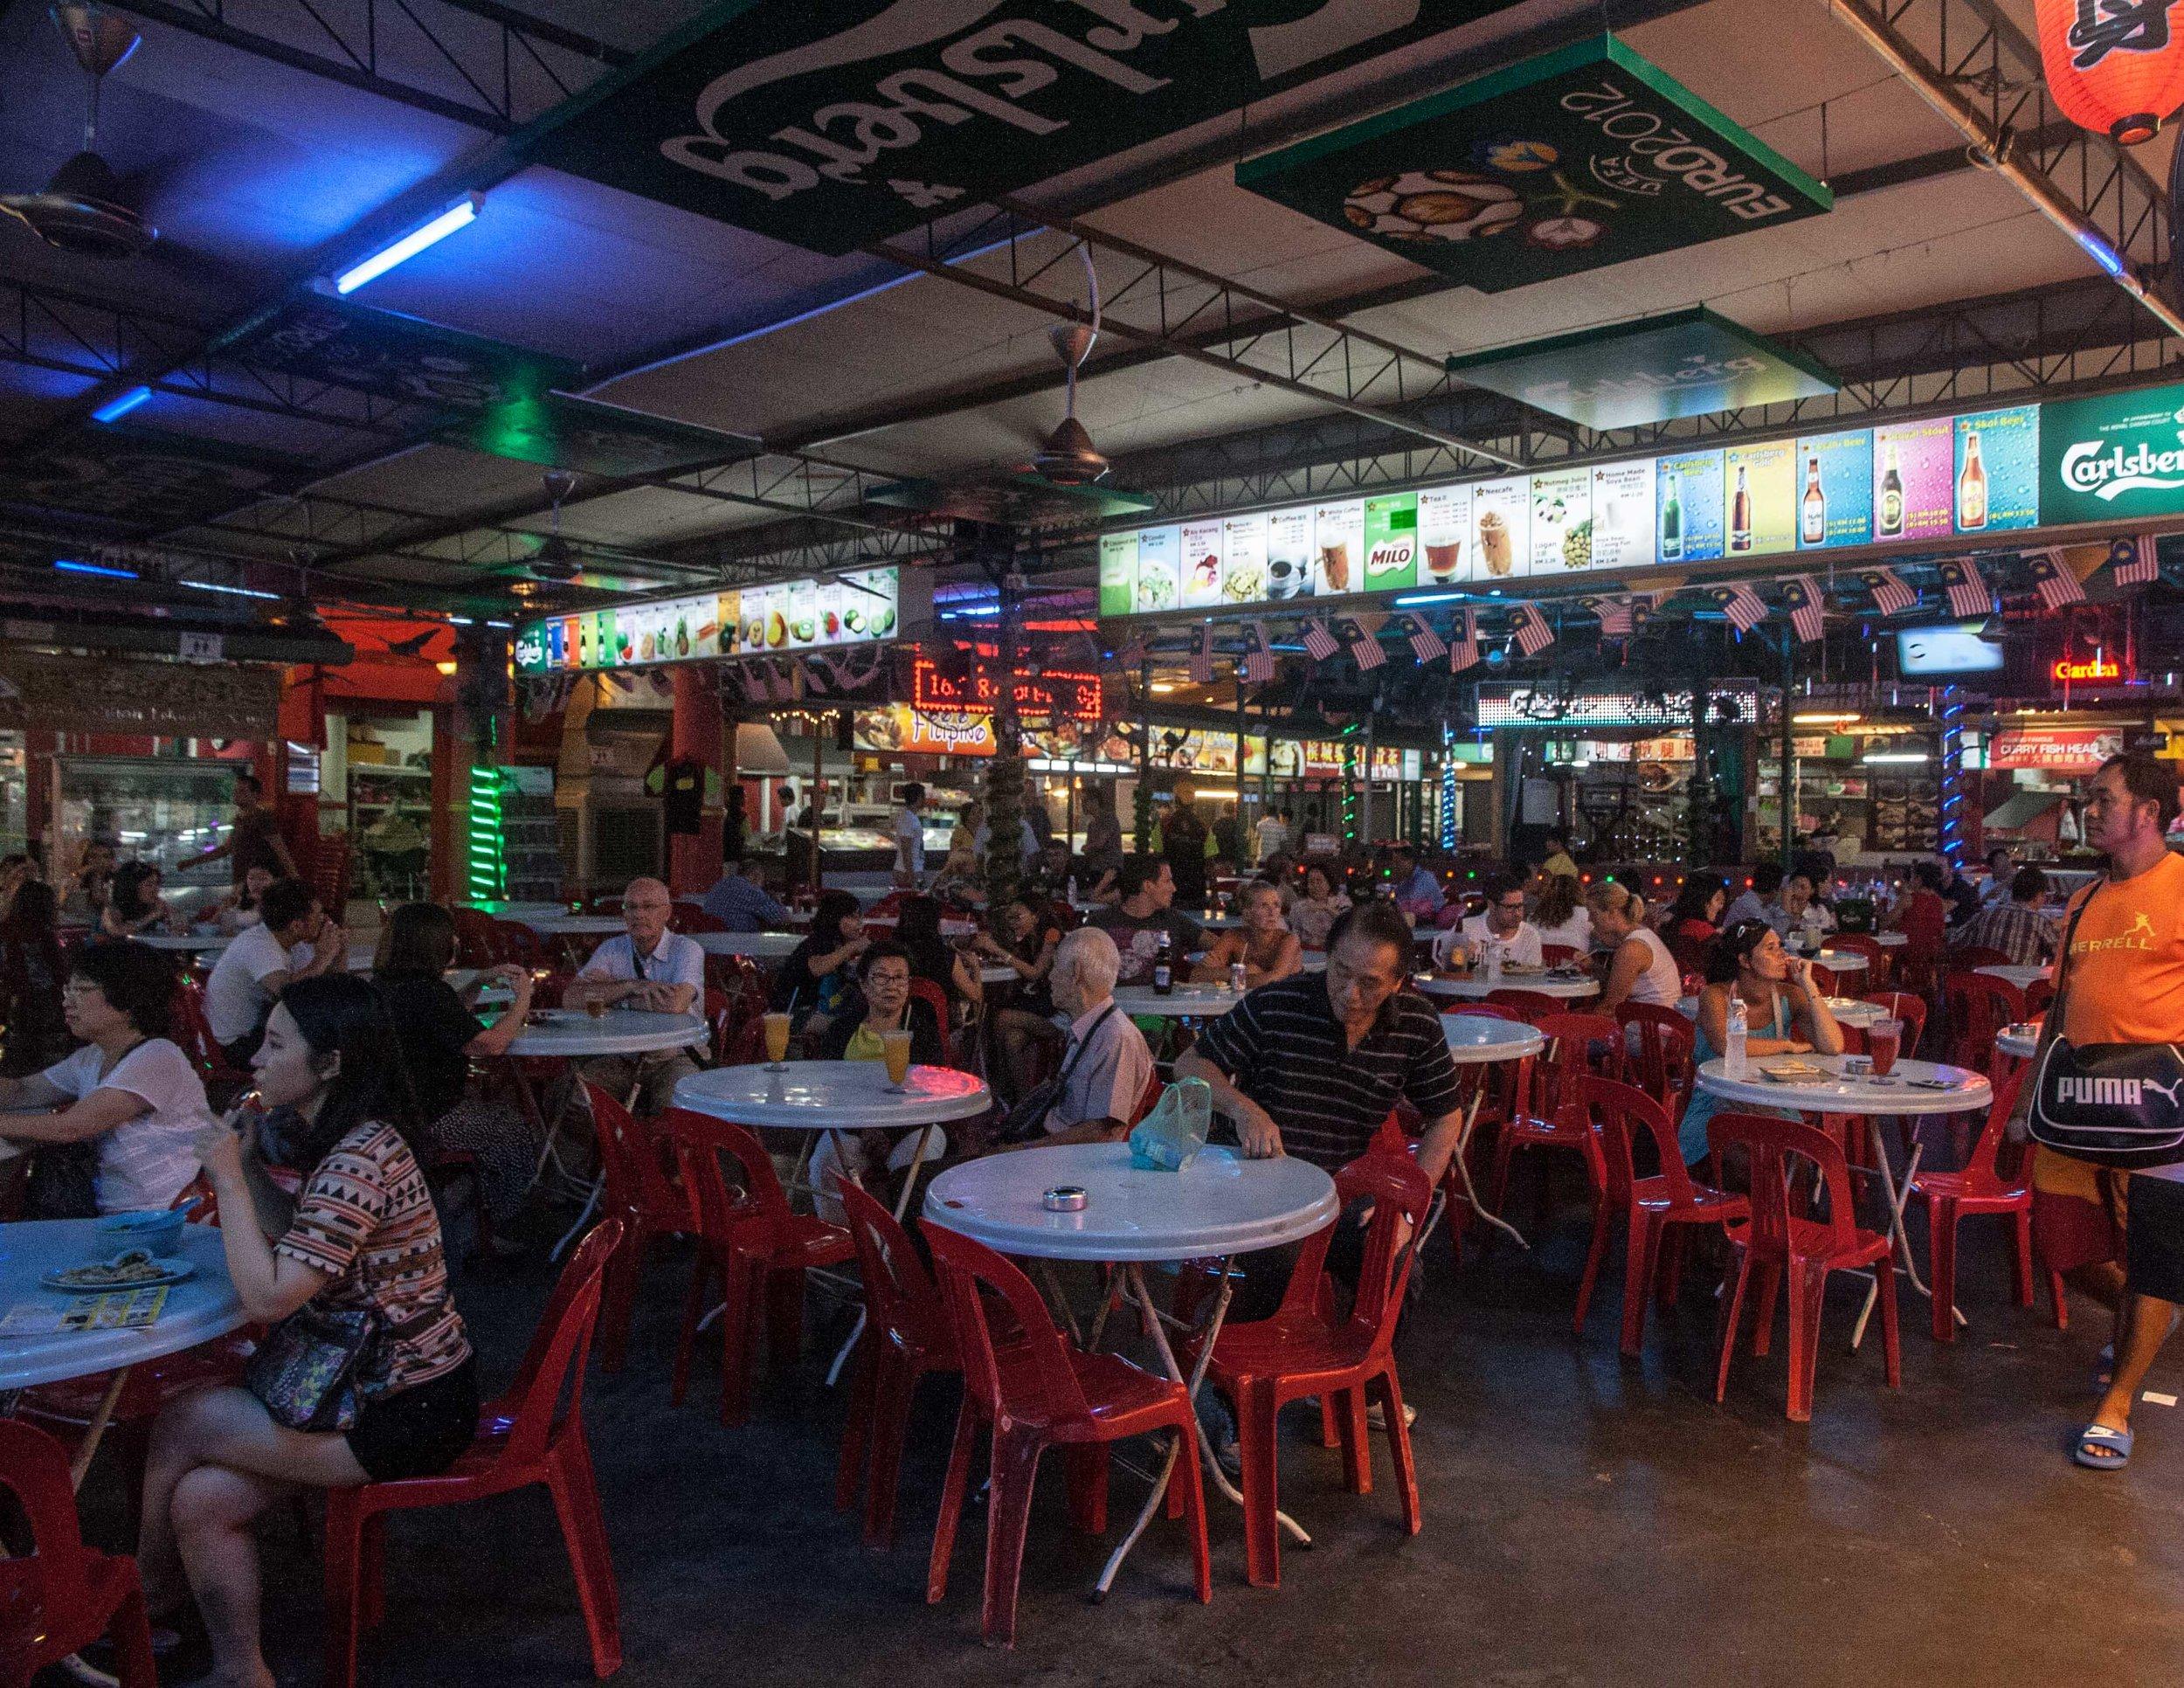 Street eats in Penang, Malaysia